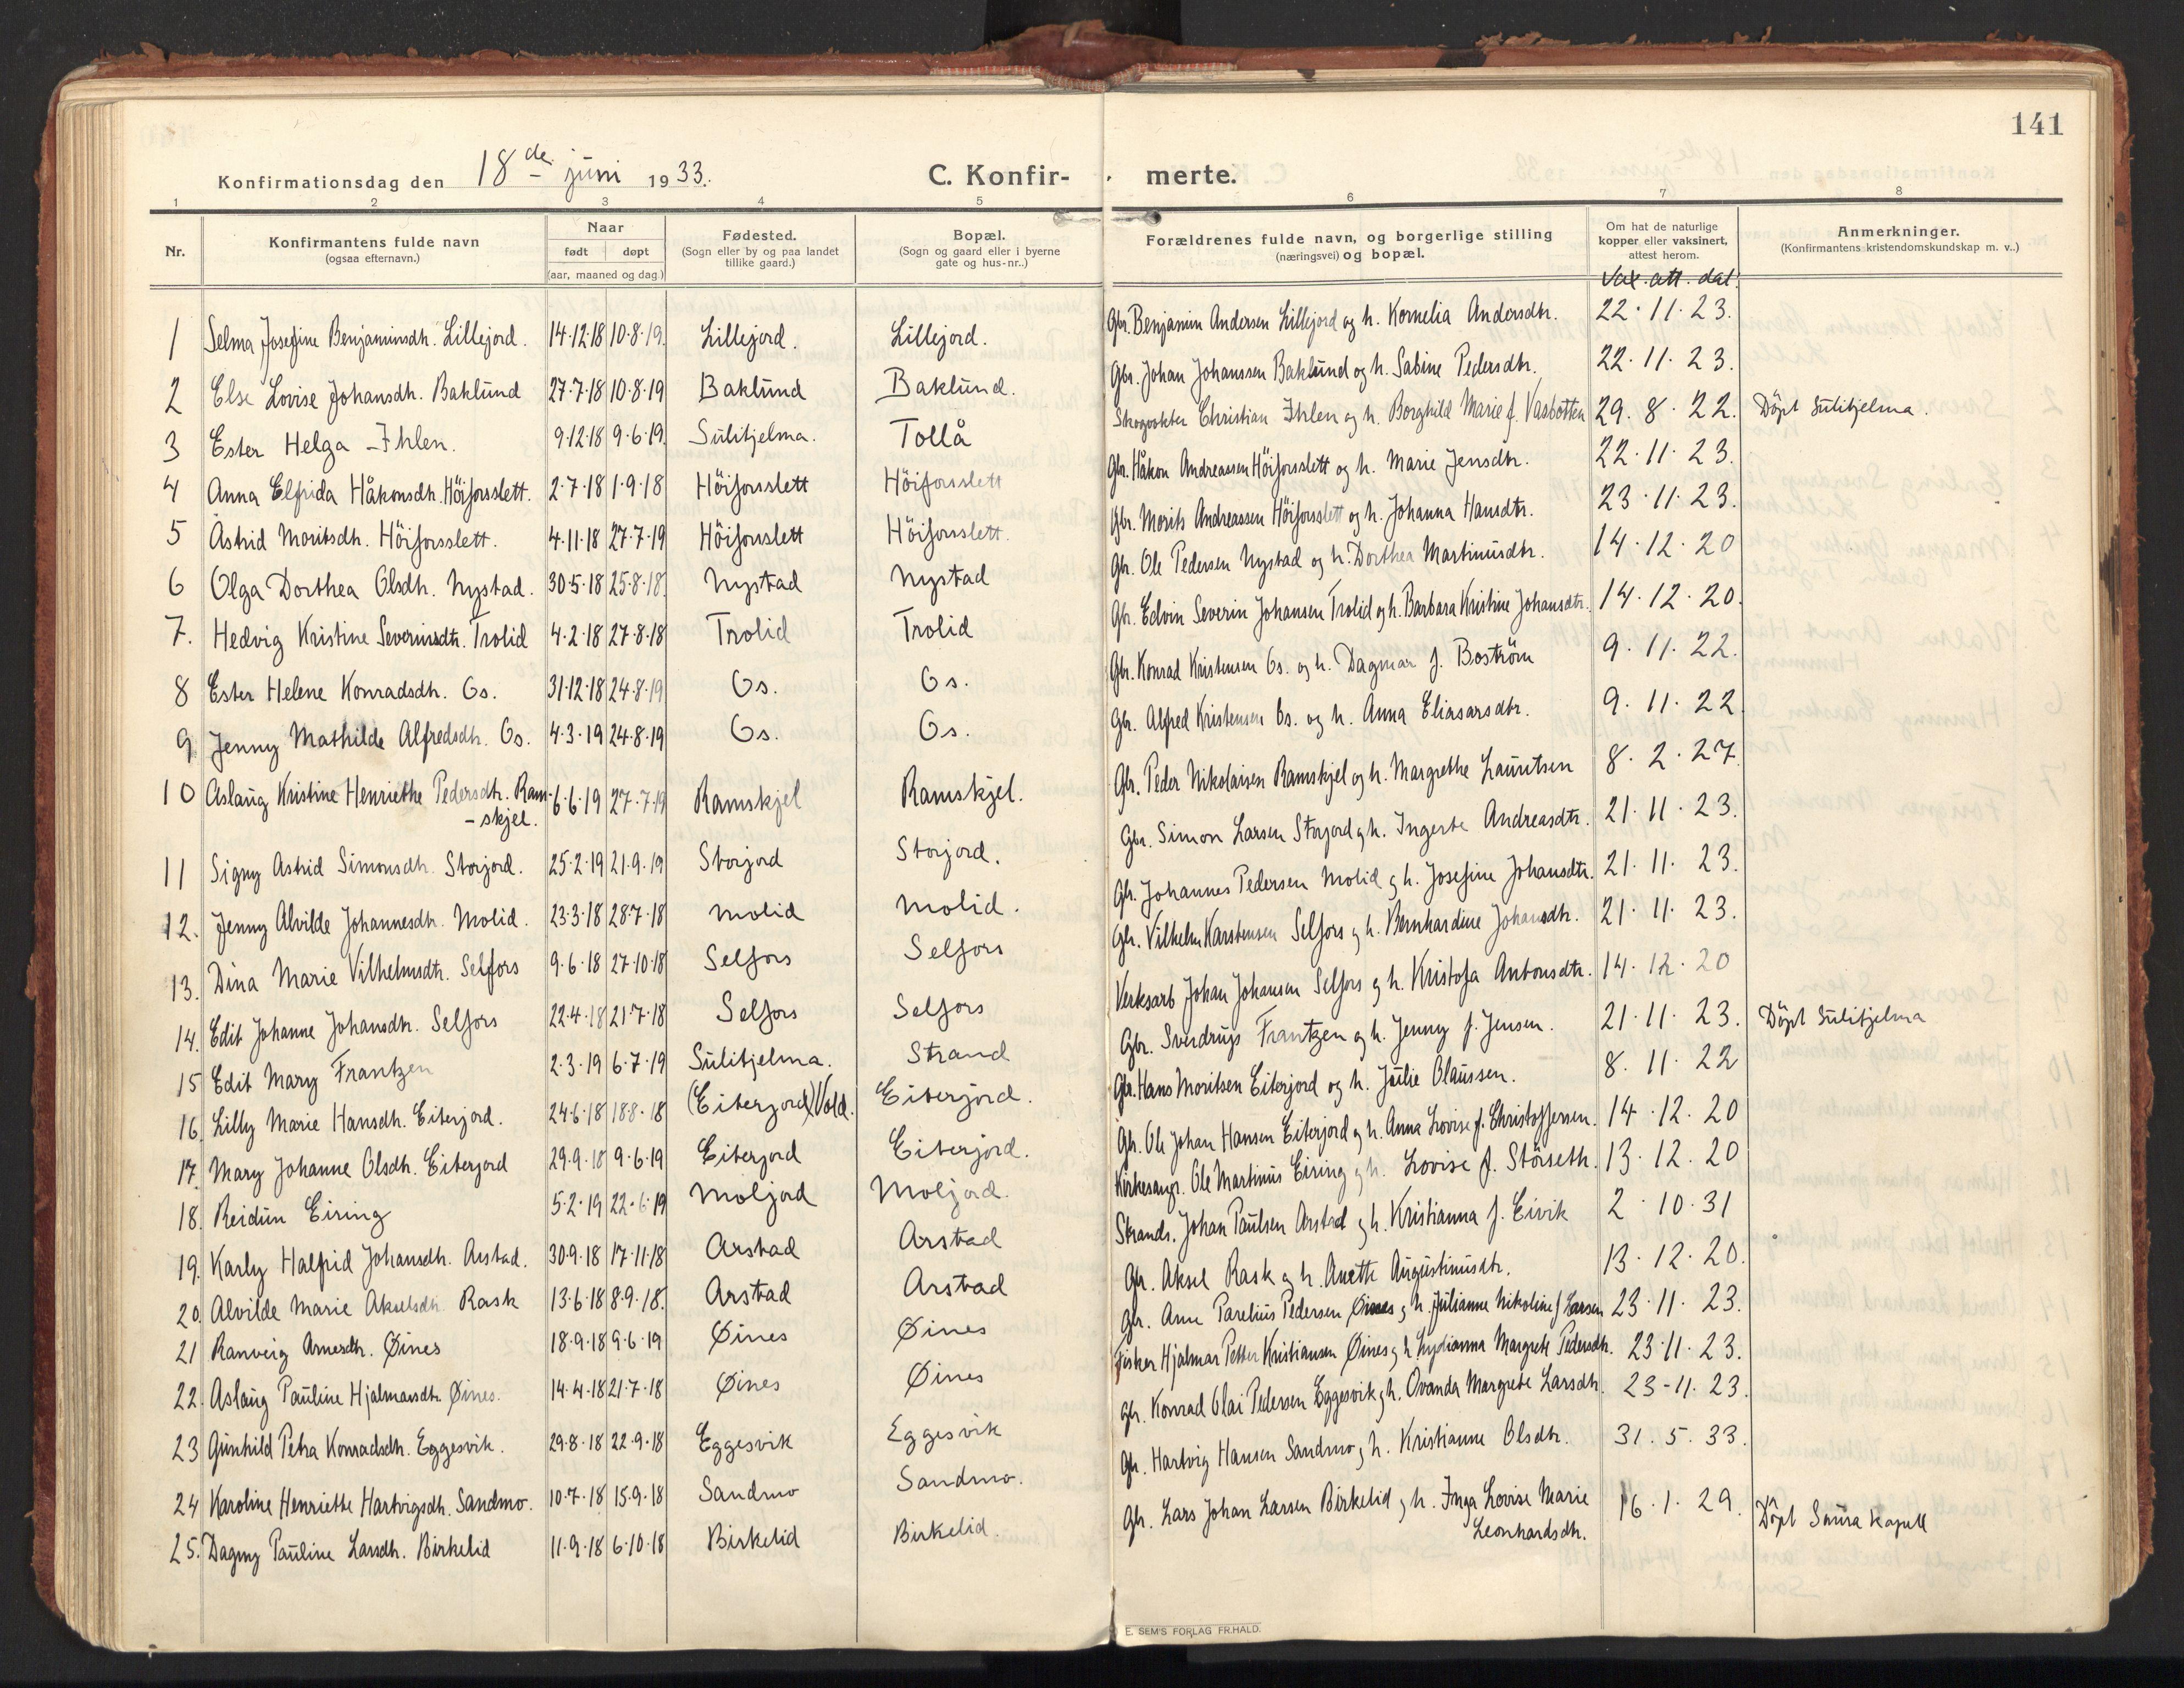 SAT, Ministerialprotokoller, klokkerbøker og fødselsregistre - Nordland, 846/L0650: Ministerialbok nr. 846A08, 1916-1935, s. 141